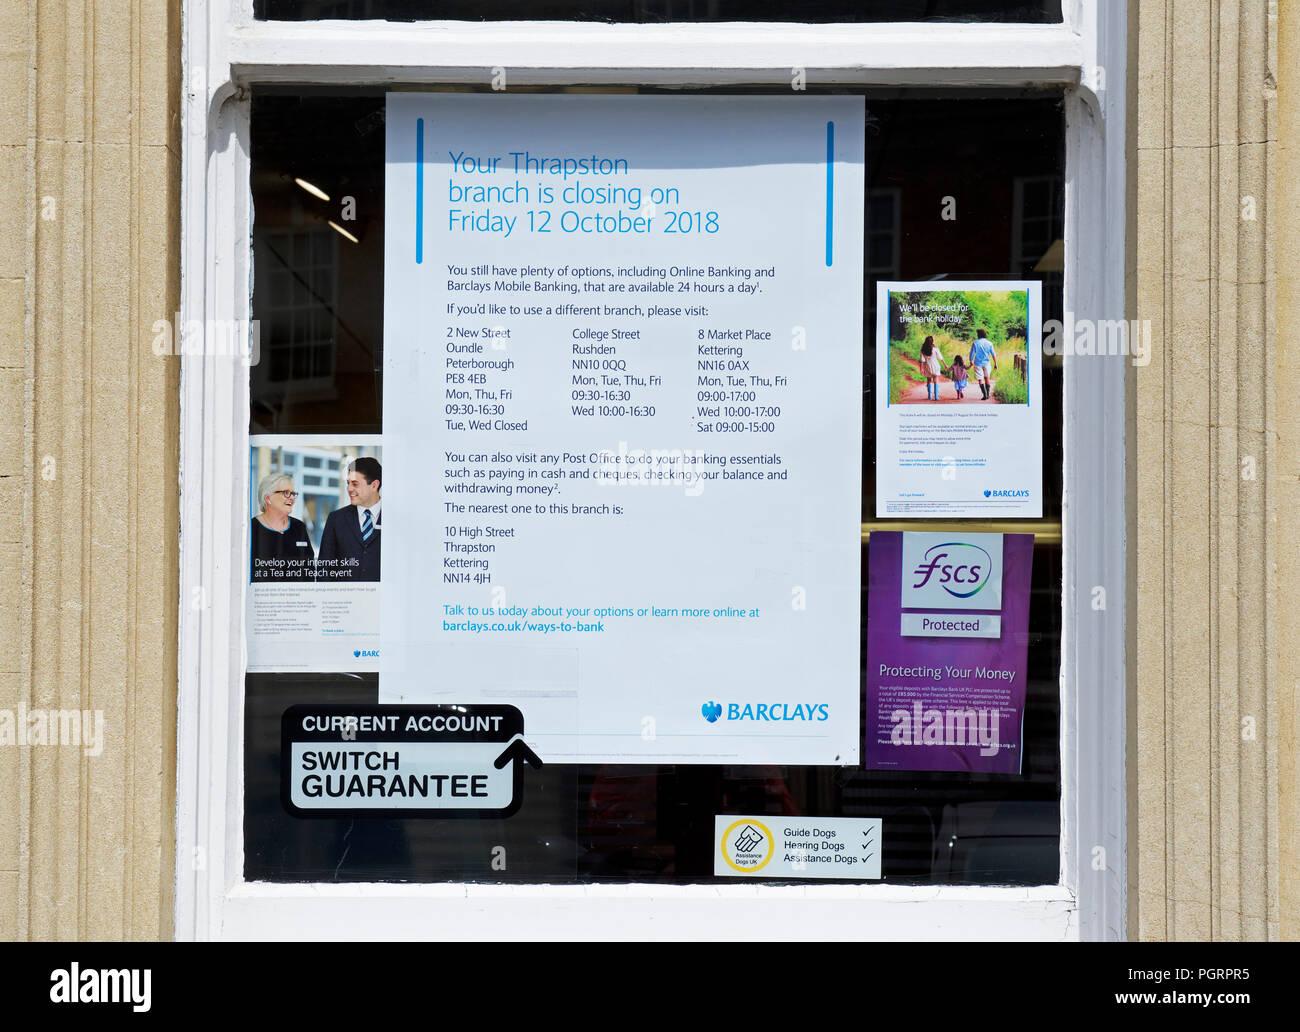 Sign announcing bank closure, Thrapston, Northamptonshire, England UK - Stock Image